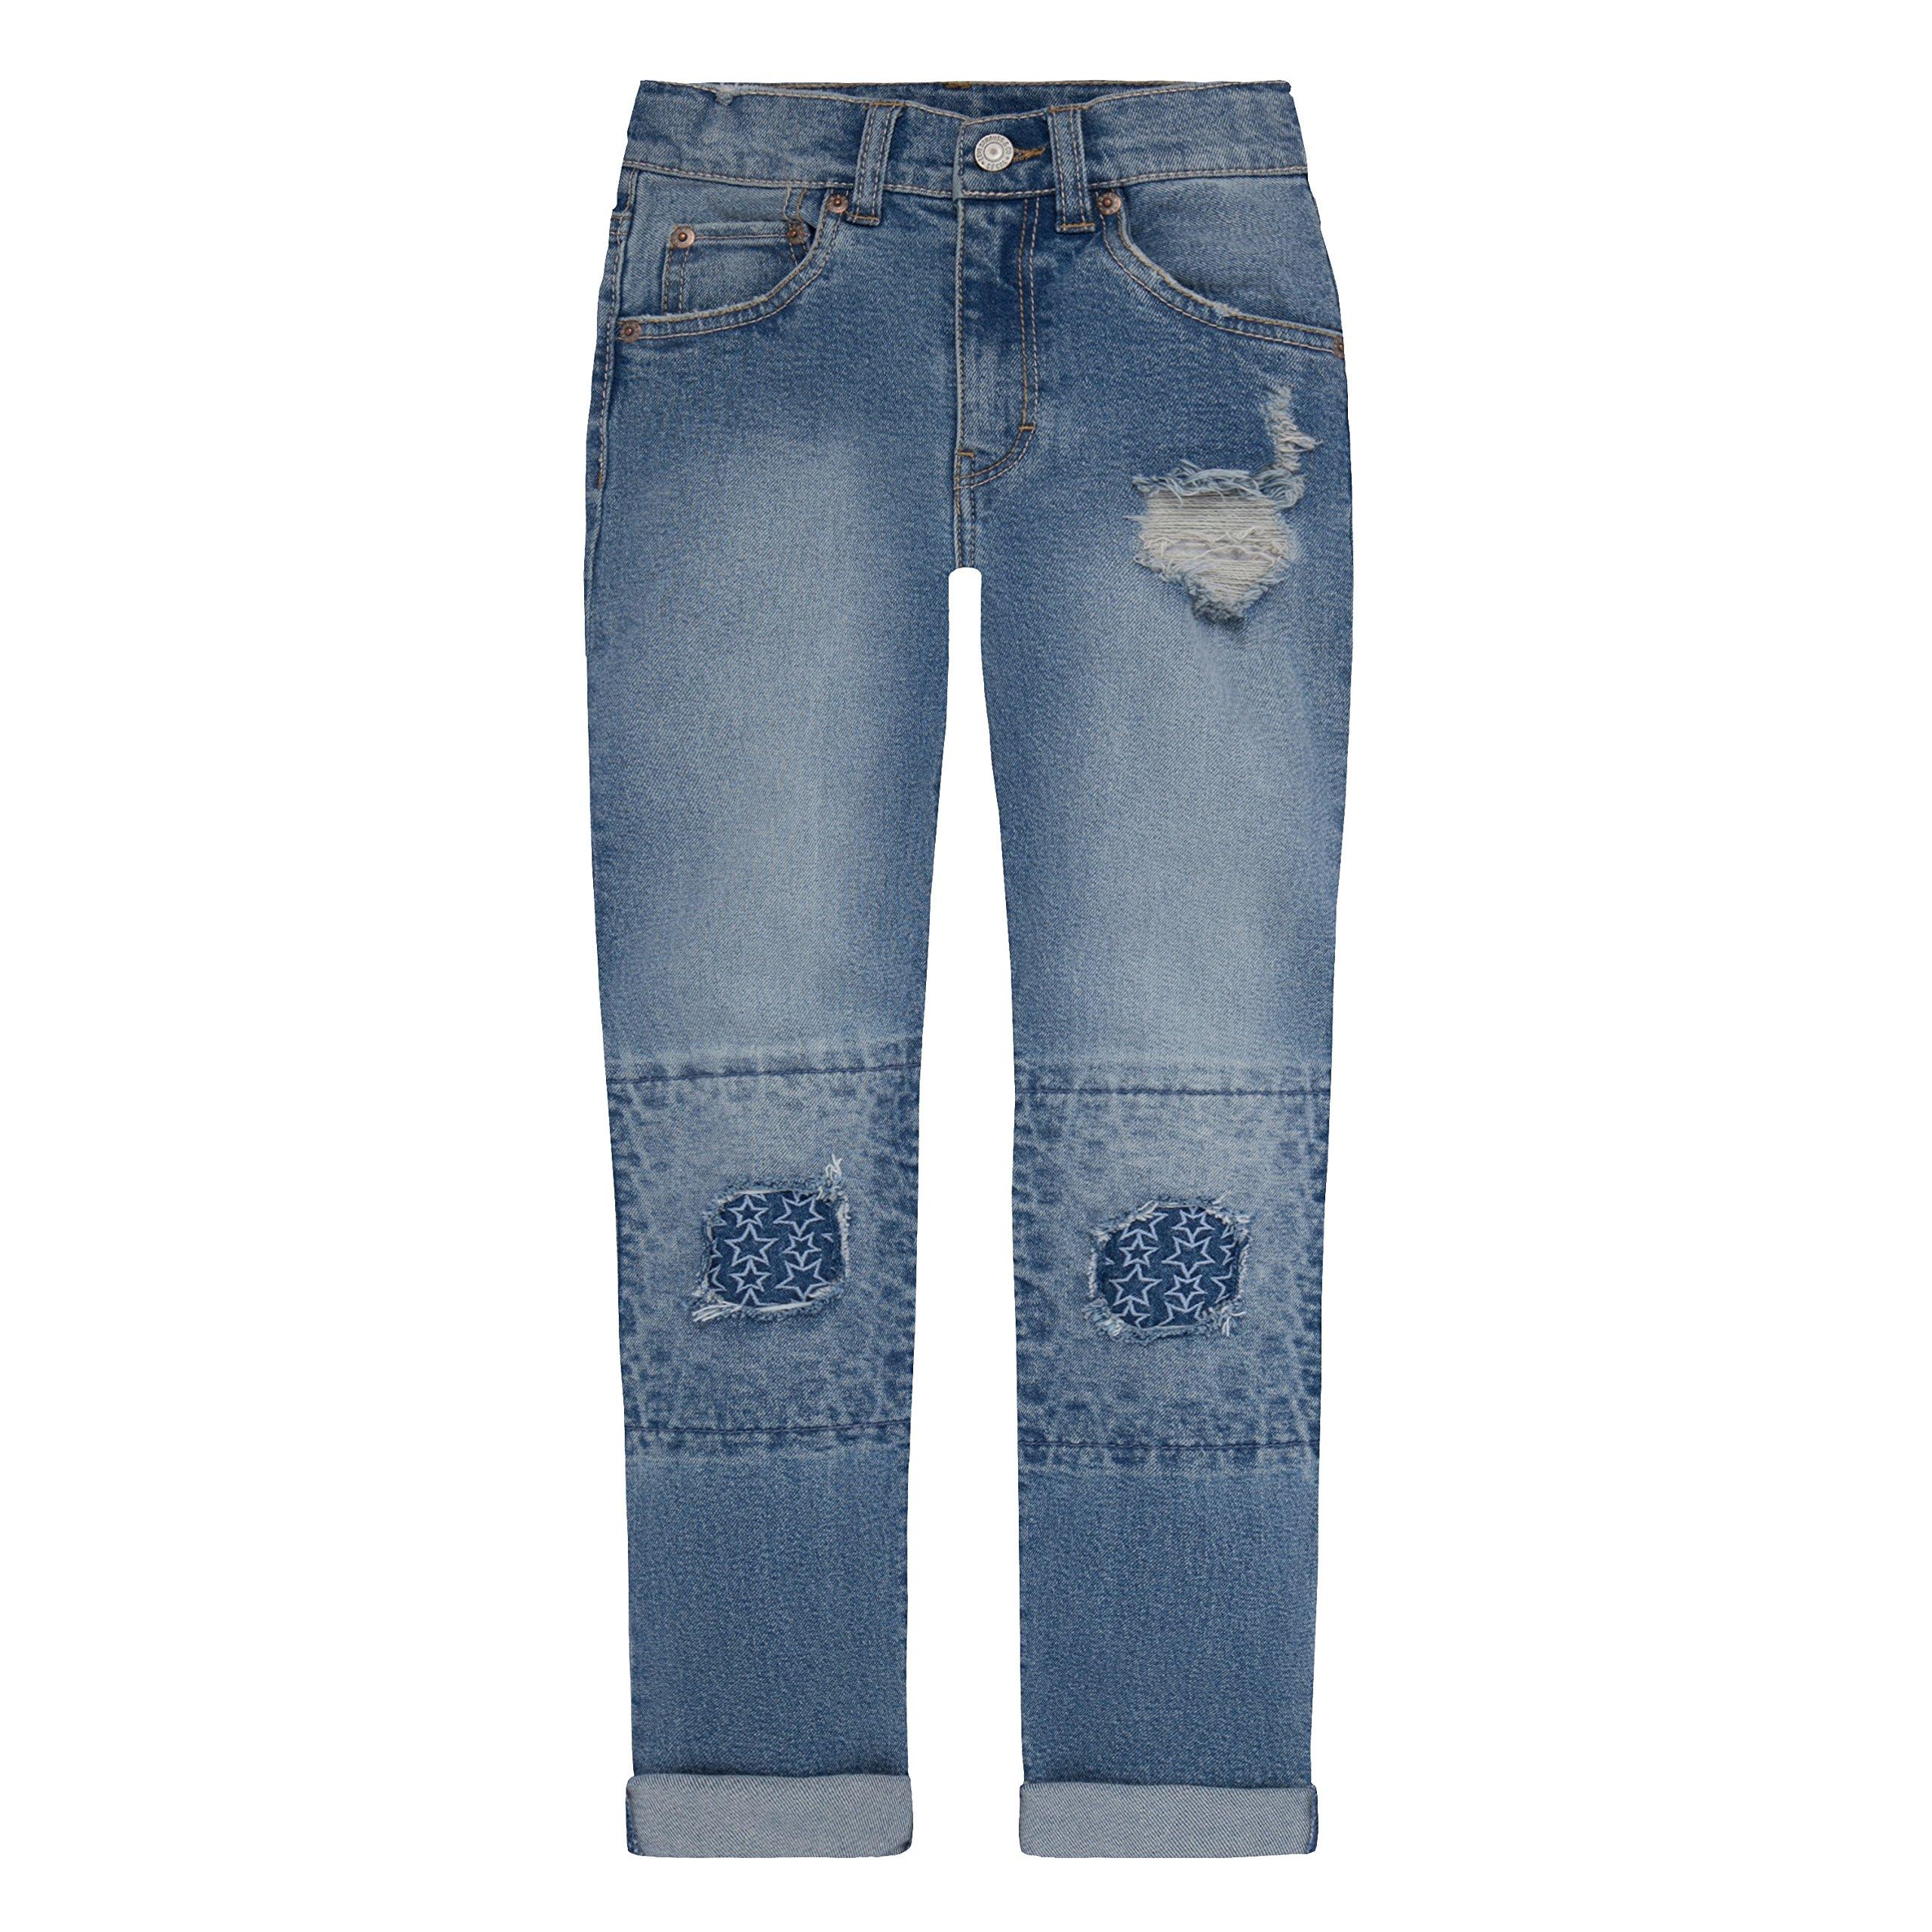 Levi's Girls' Big Girlfriend Fit Jeans, Nirvana, 12 by Levi's